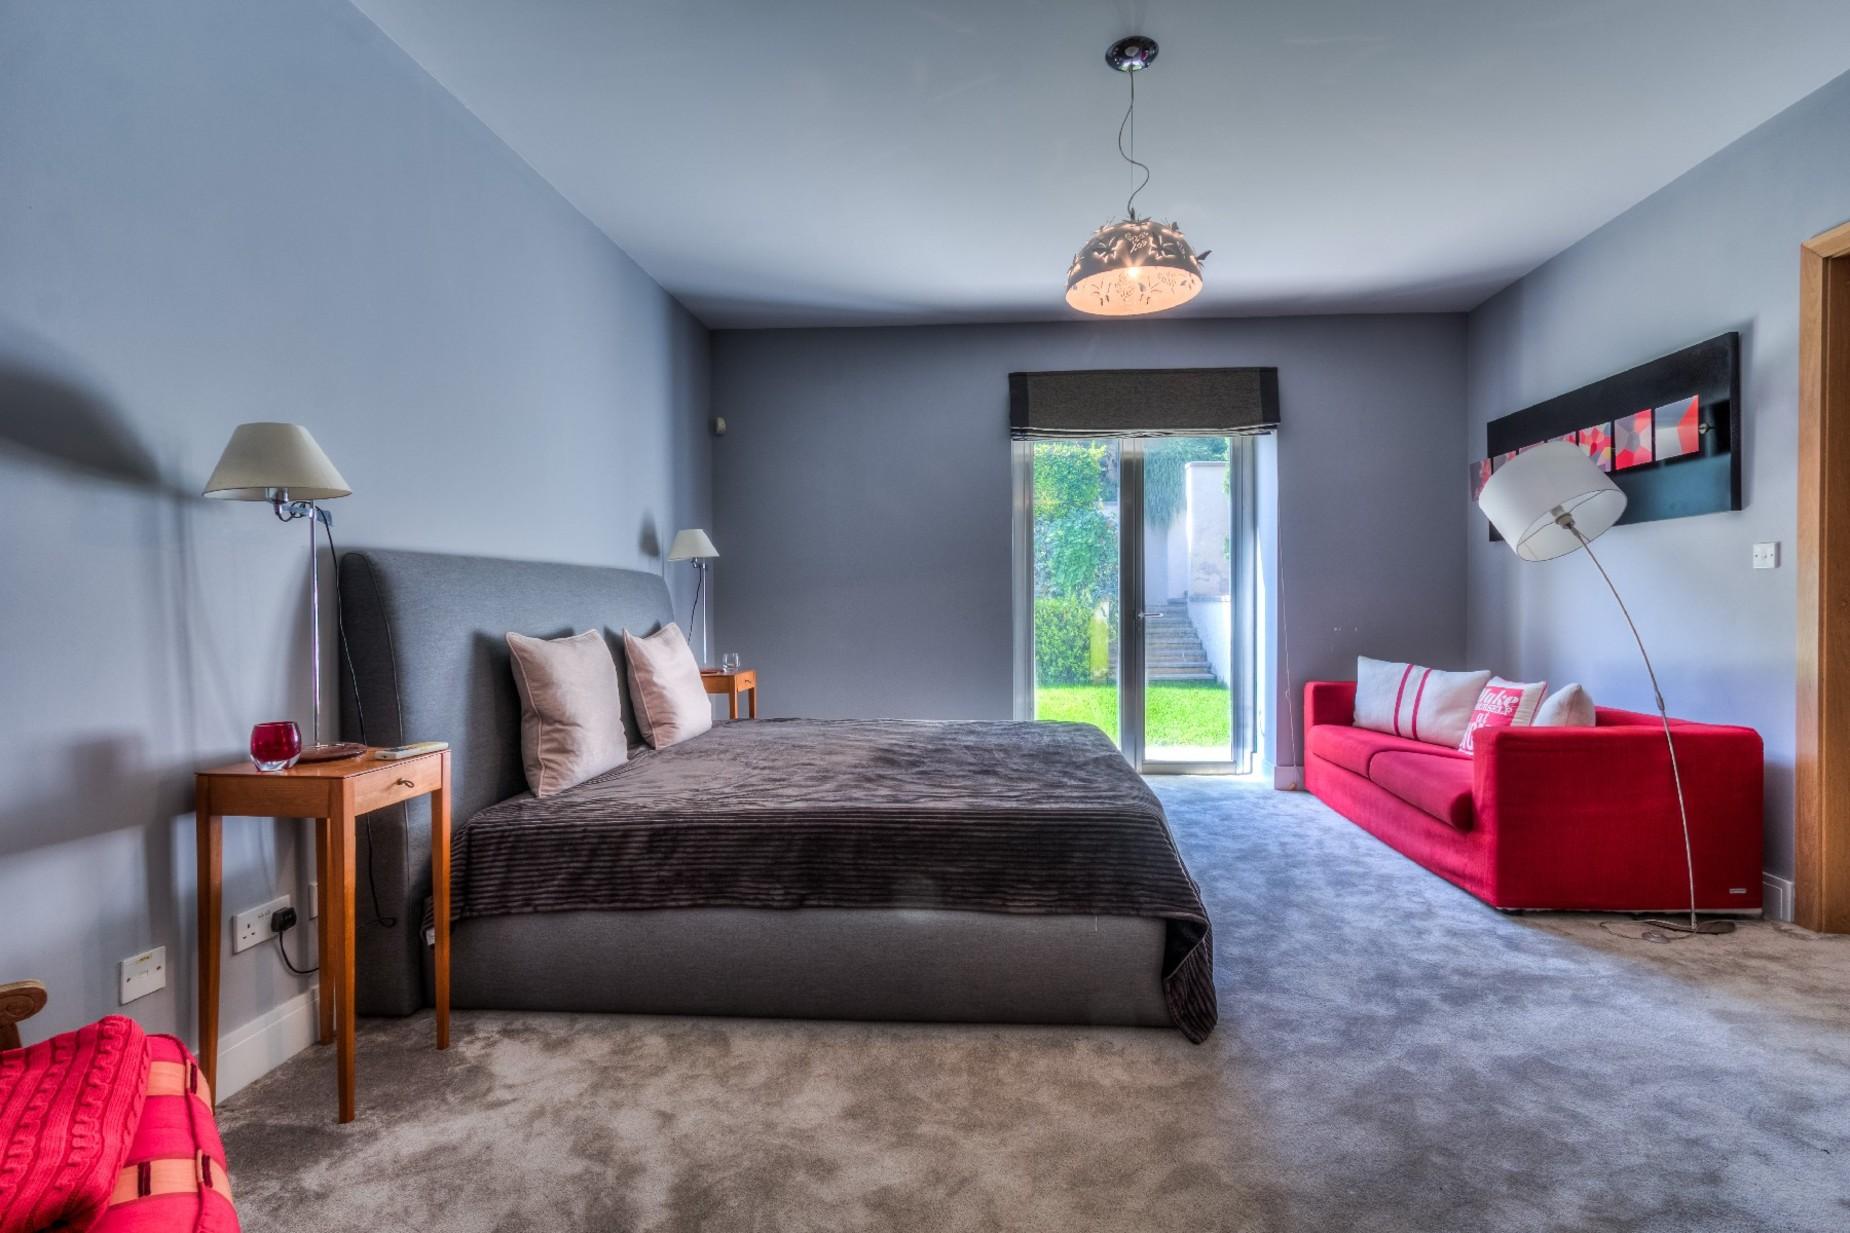 7 bed Villa For Sale in Bahar ic-Caghaq, Bahar ic-Caghaq - thumb 26